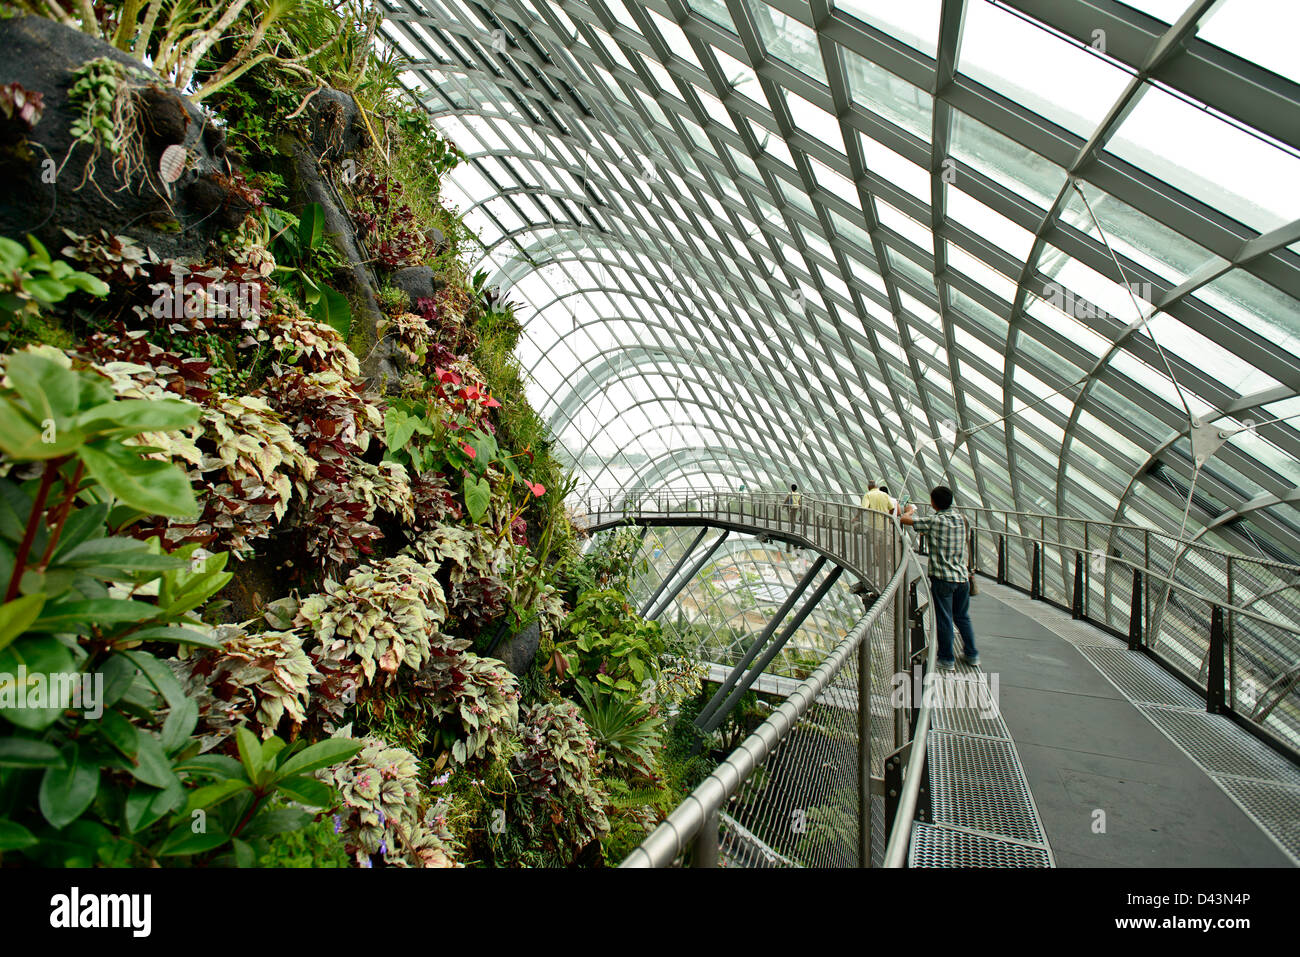 Gardens By The Bay Singapore Singapore Architect Wilkinson Eyre Stock Photo Alamy